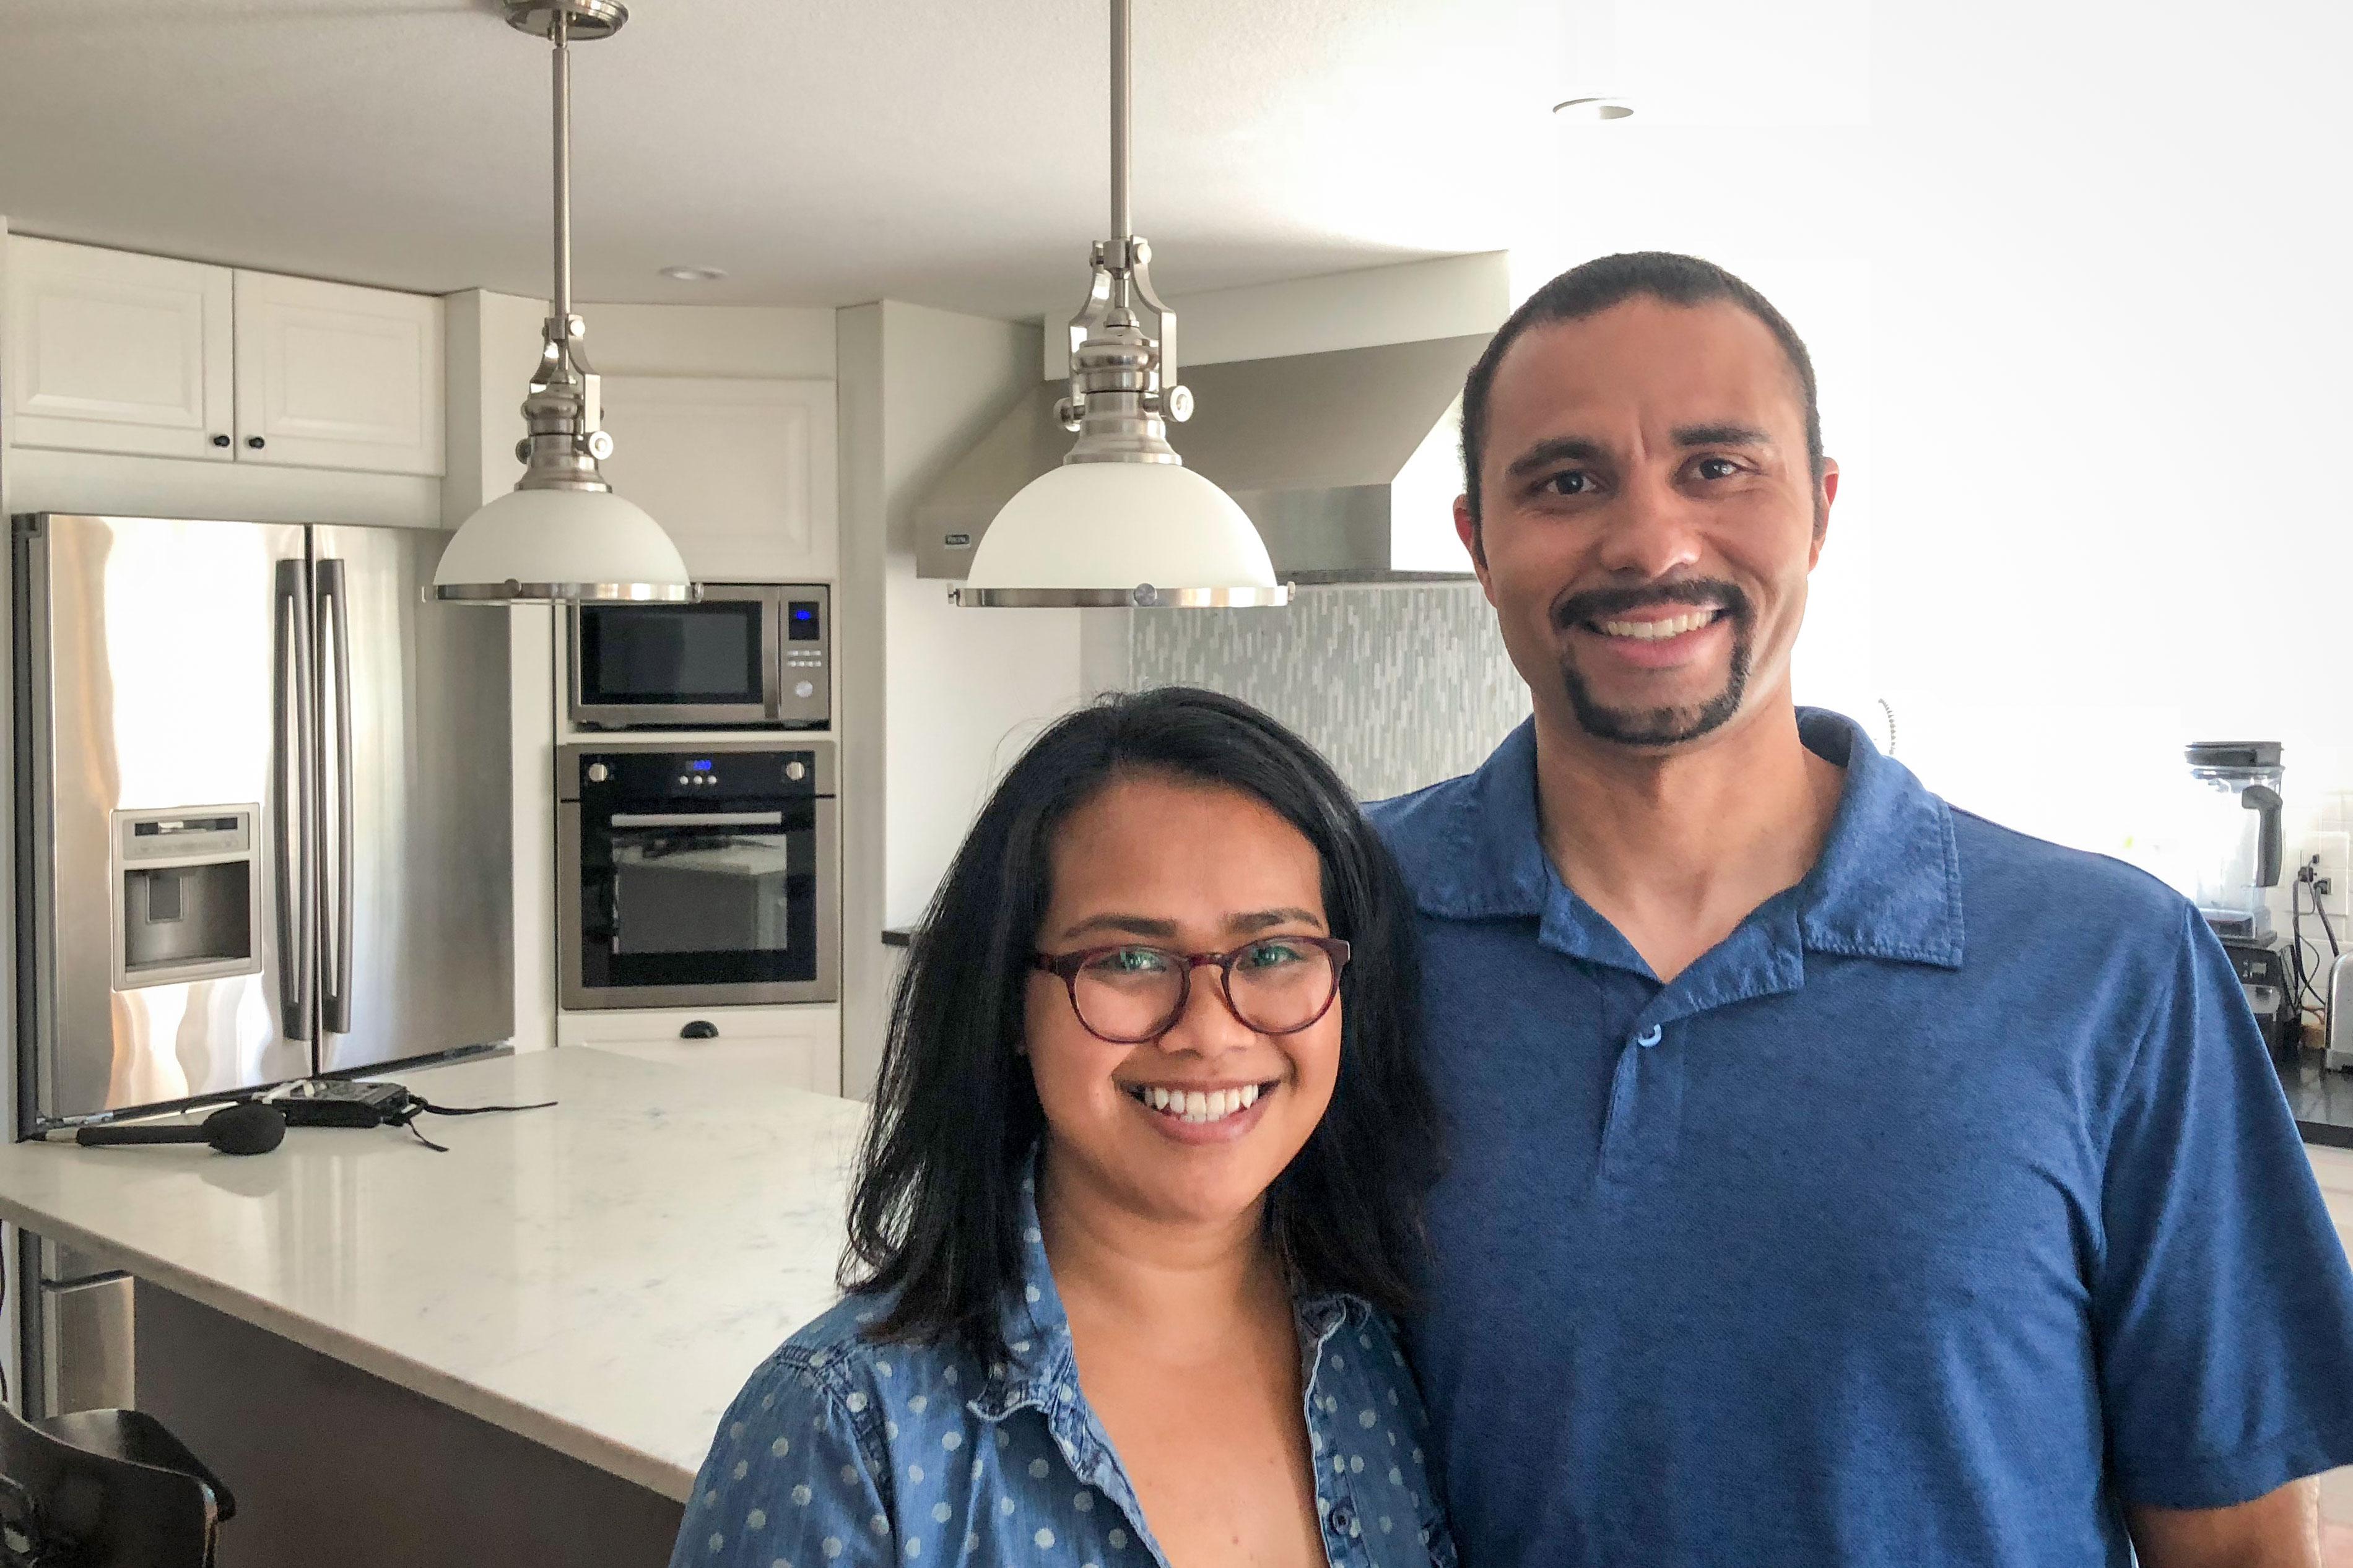 Photo: Denver Home Remodel Blitz 1 | Marjie and Ben Vic - BMarkus